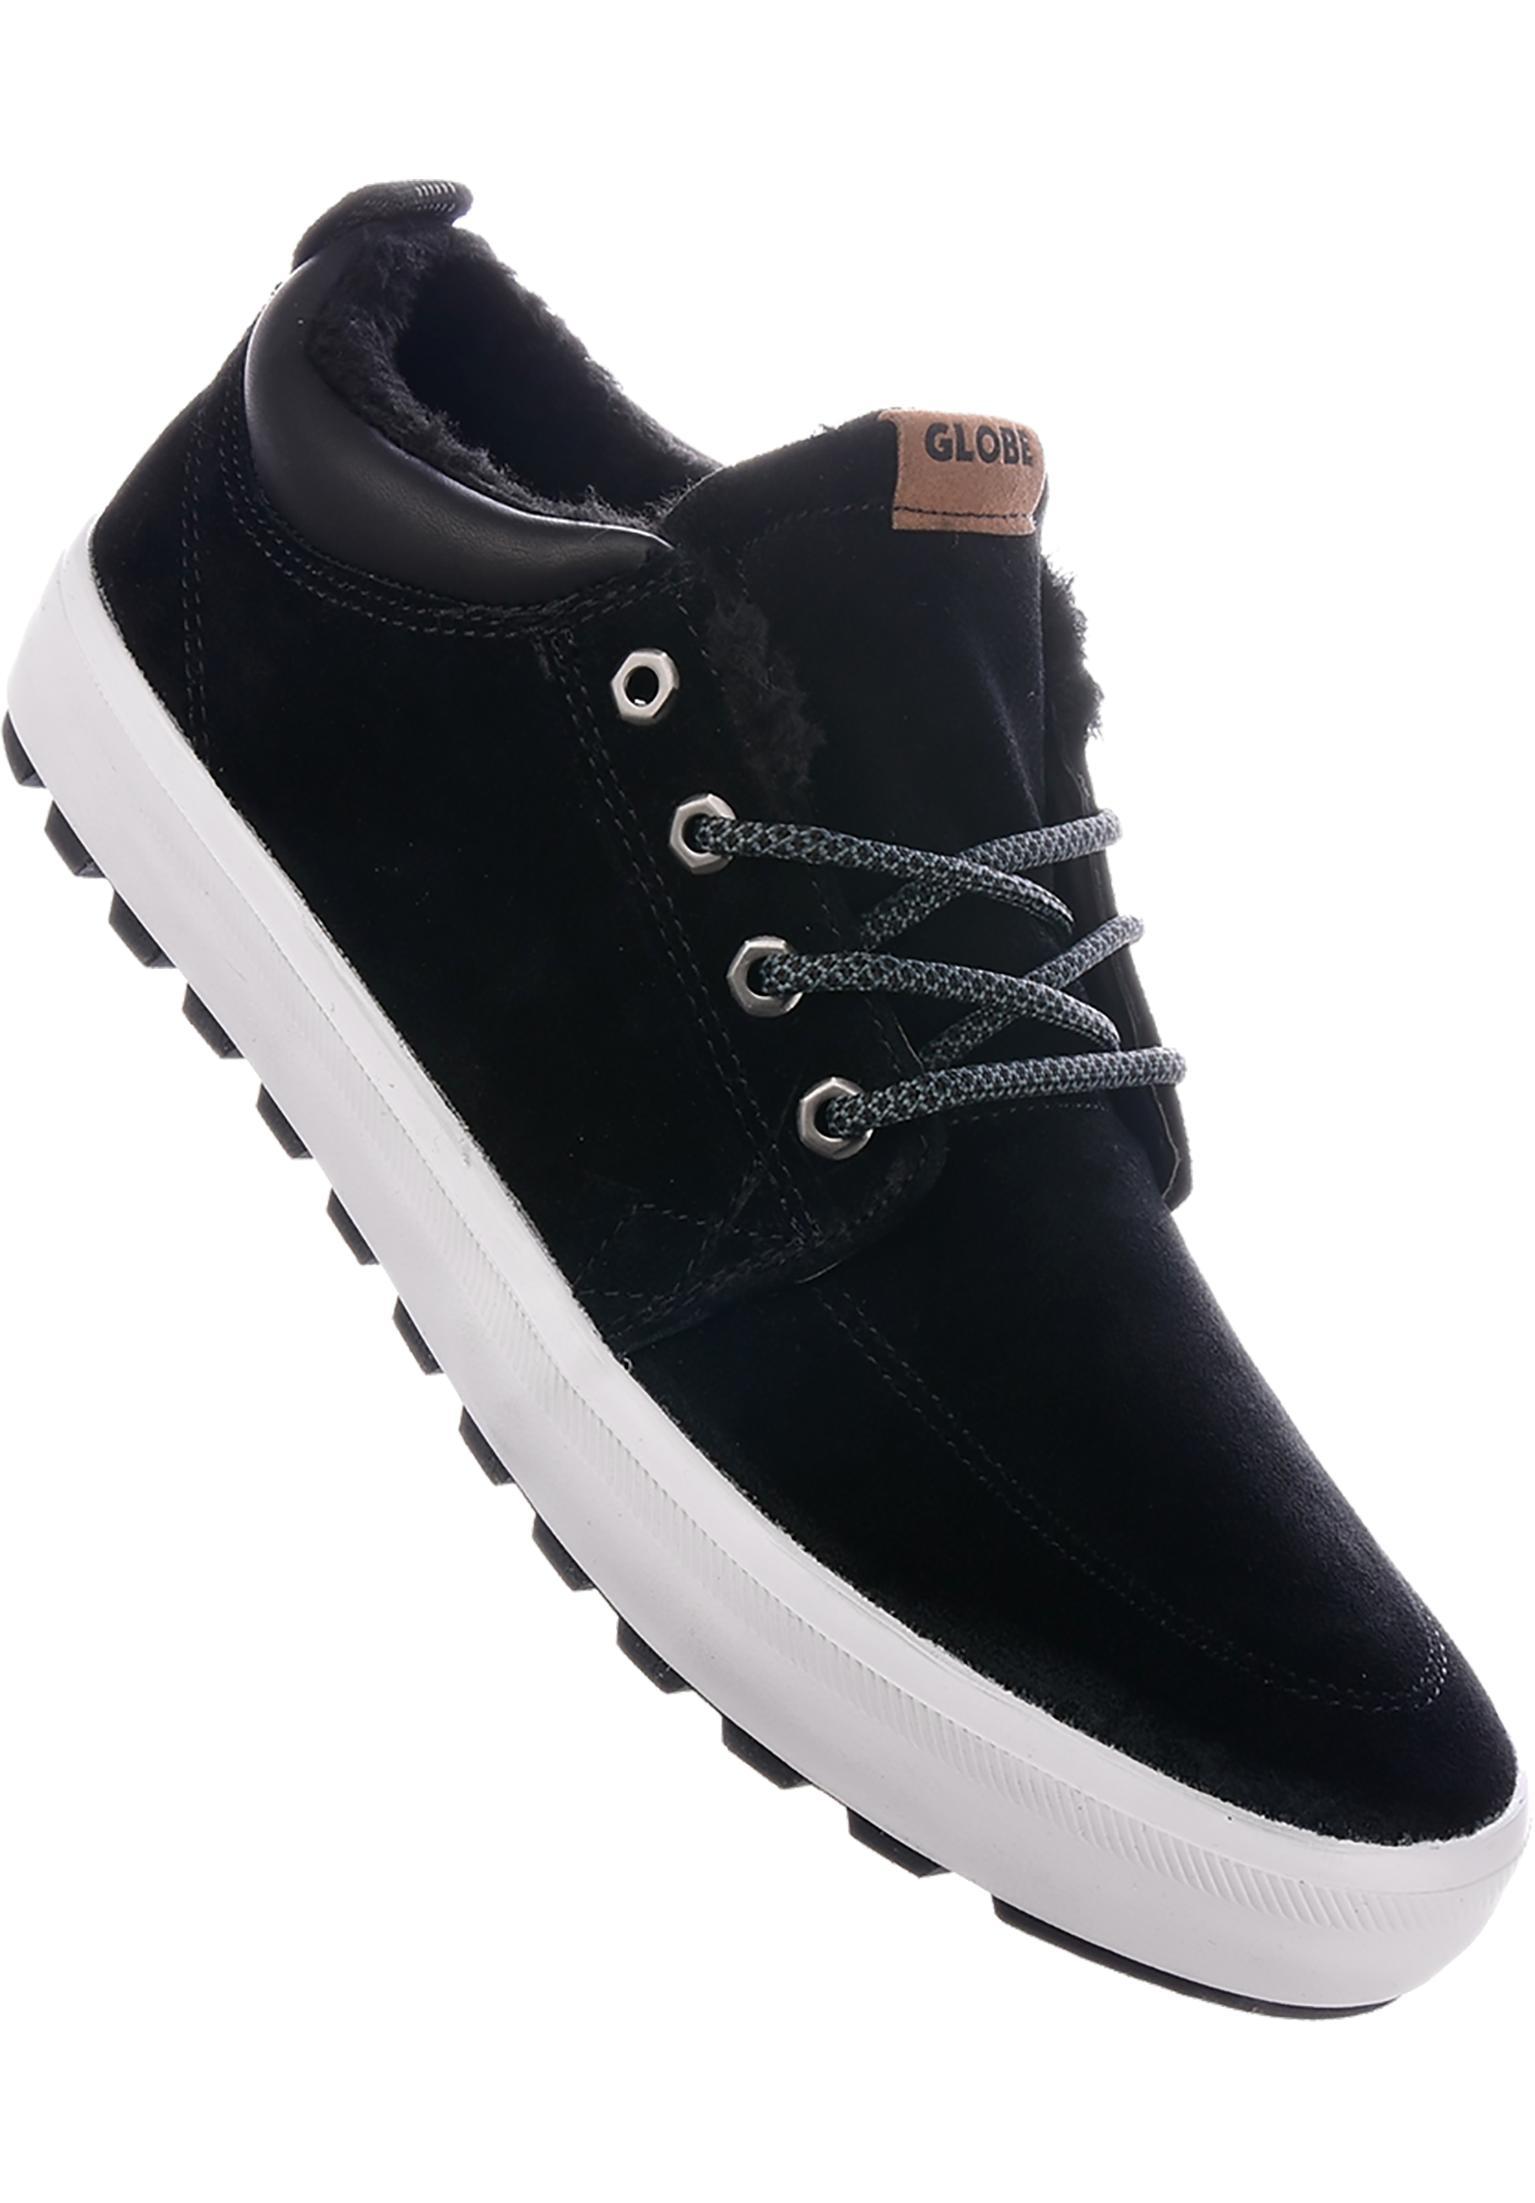 72694fc31f6 GS Chukka Fur Globe All Shoes in black-white for Men